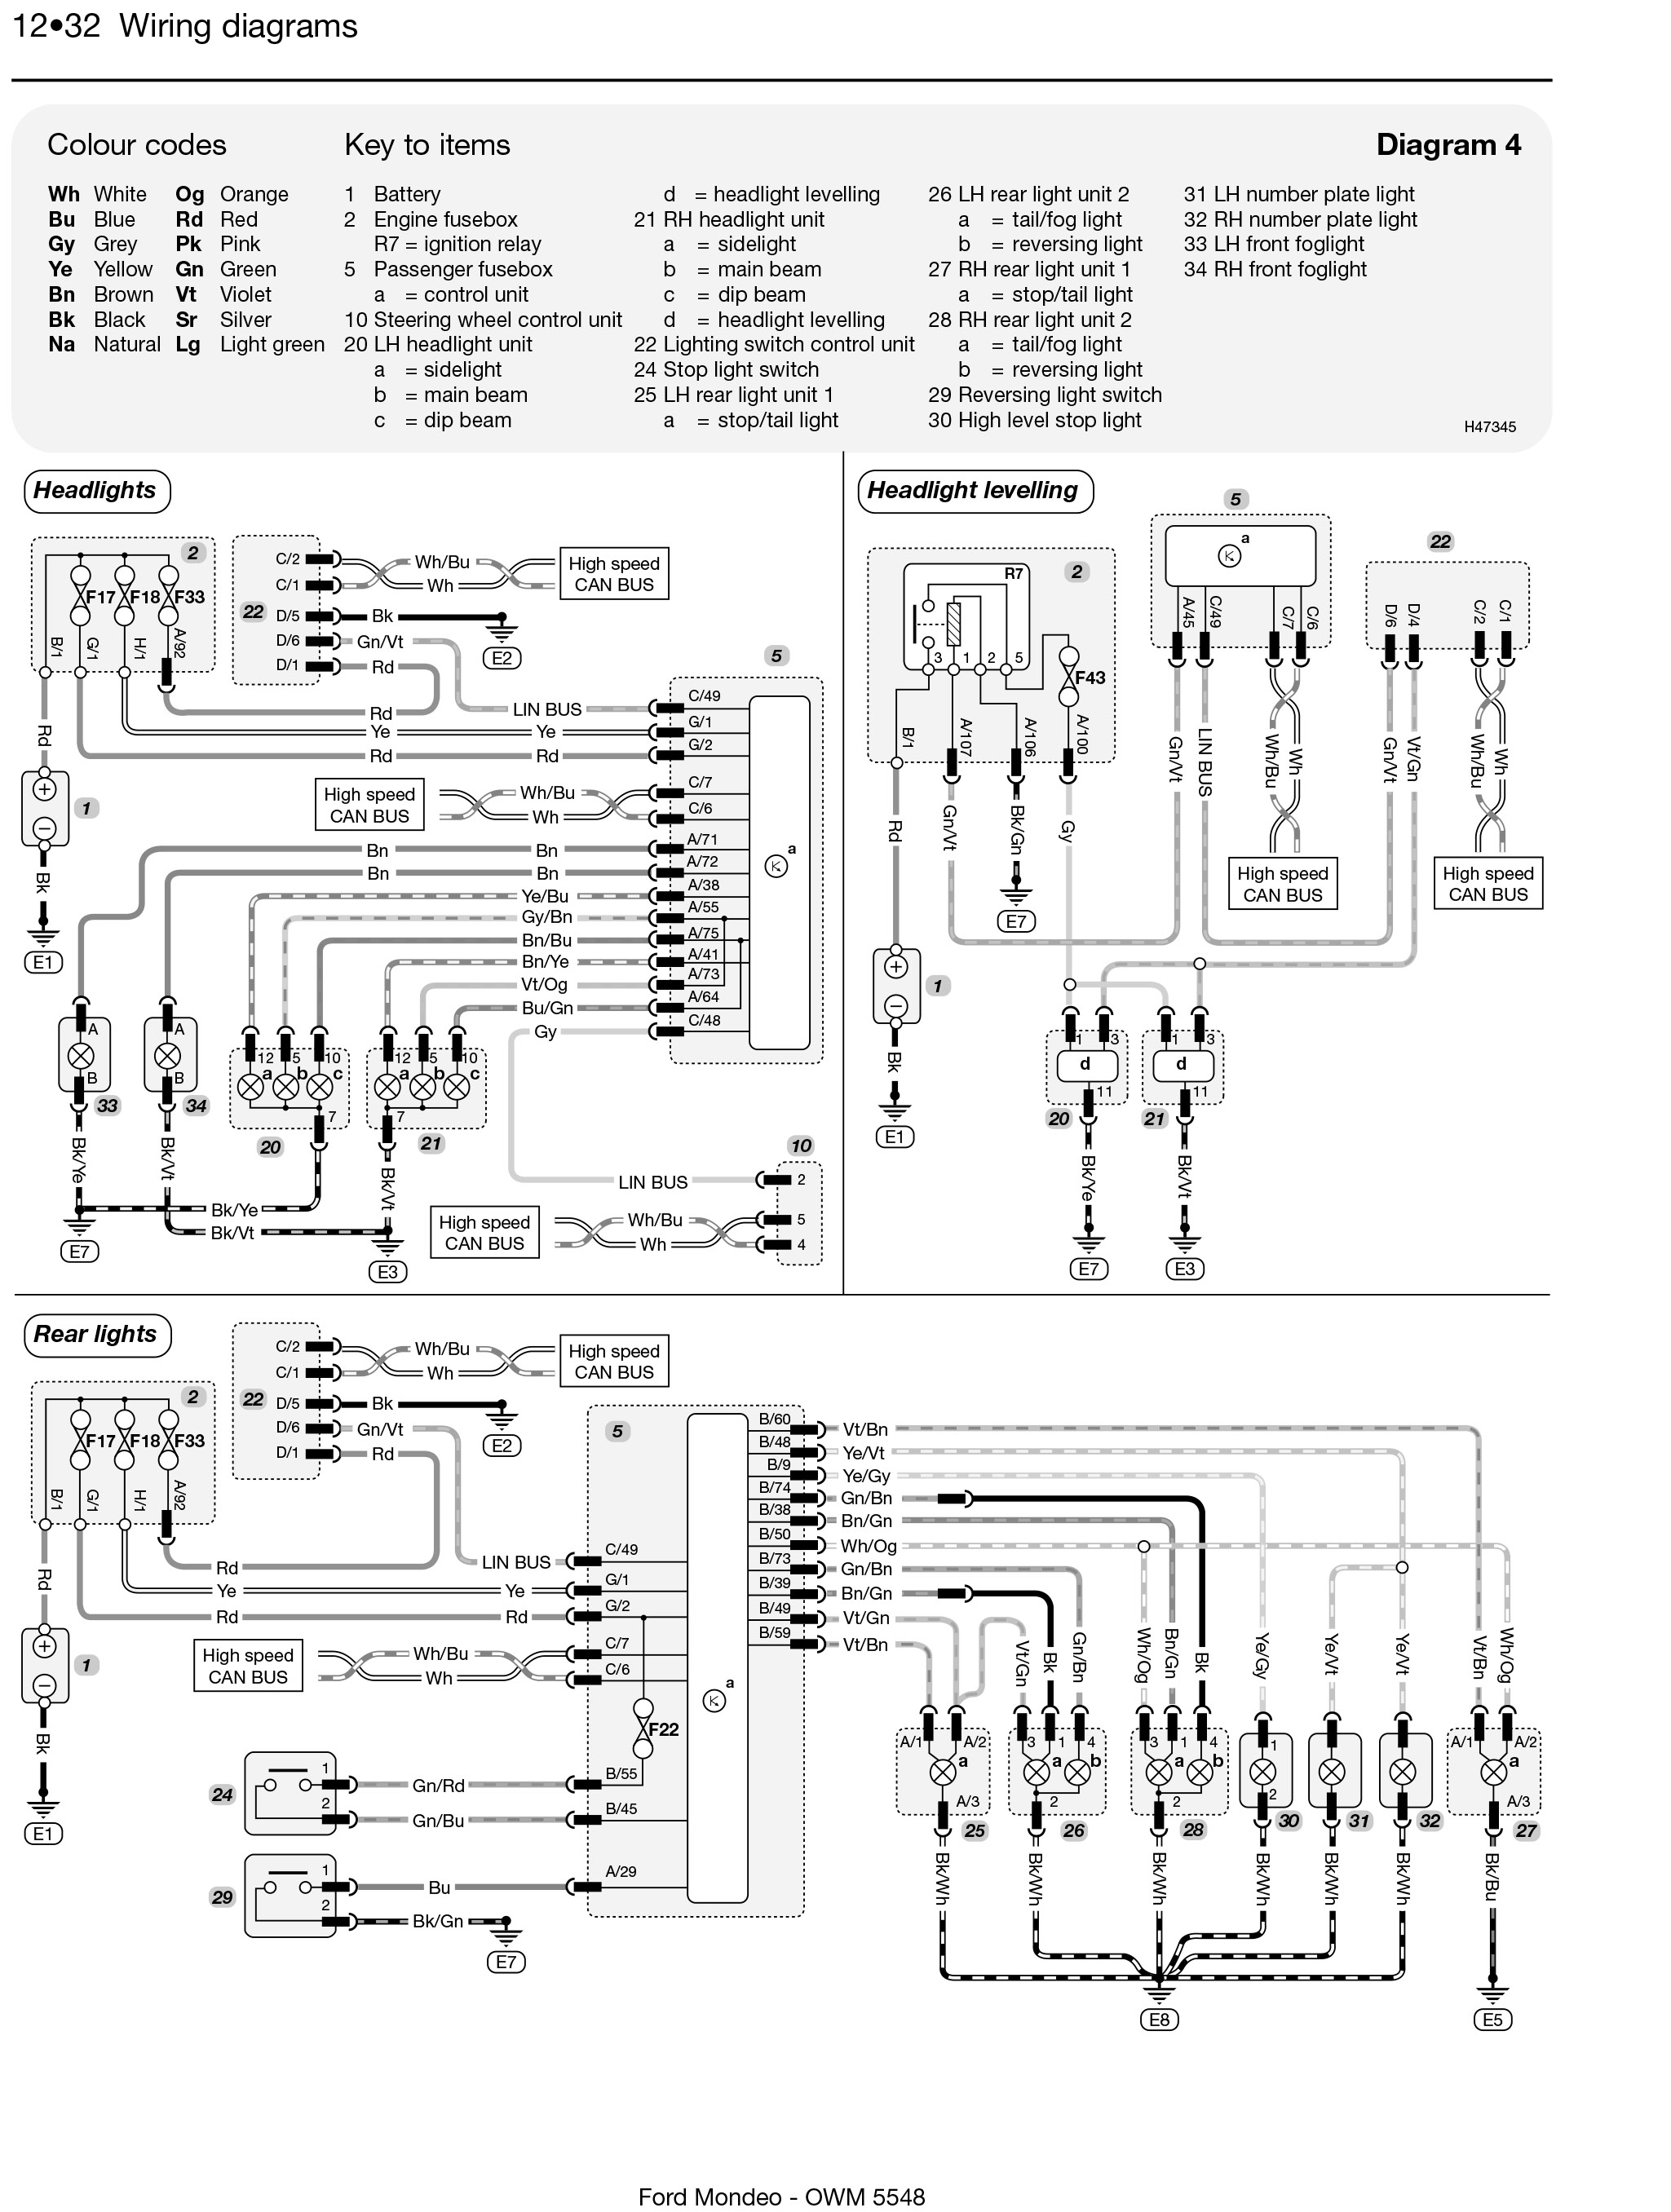 Haynes Wiring Diagram - Read All Wiring Diagram on